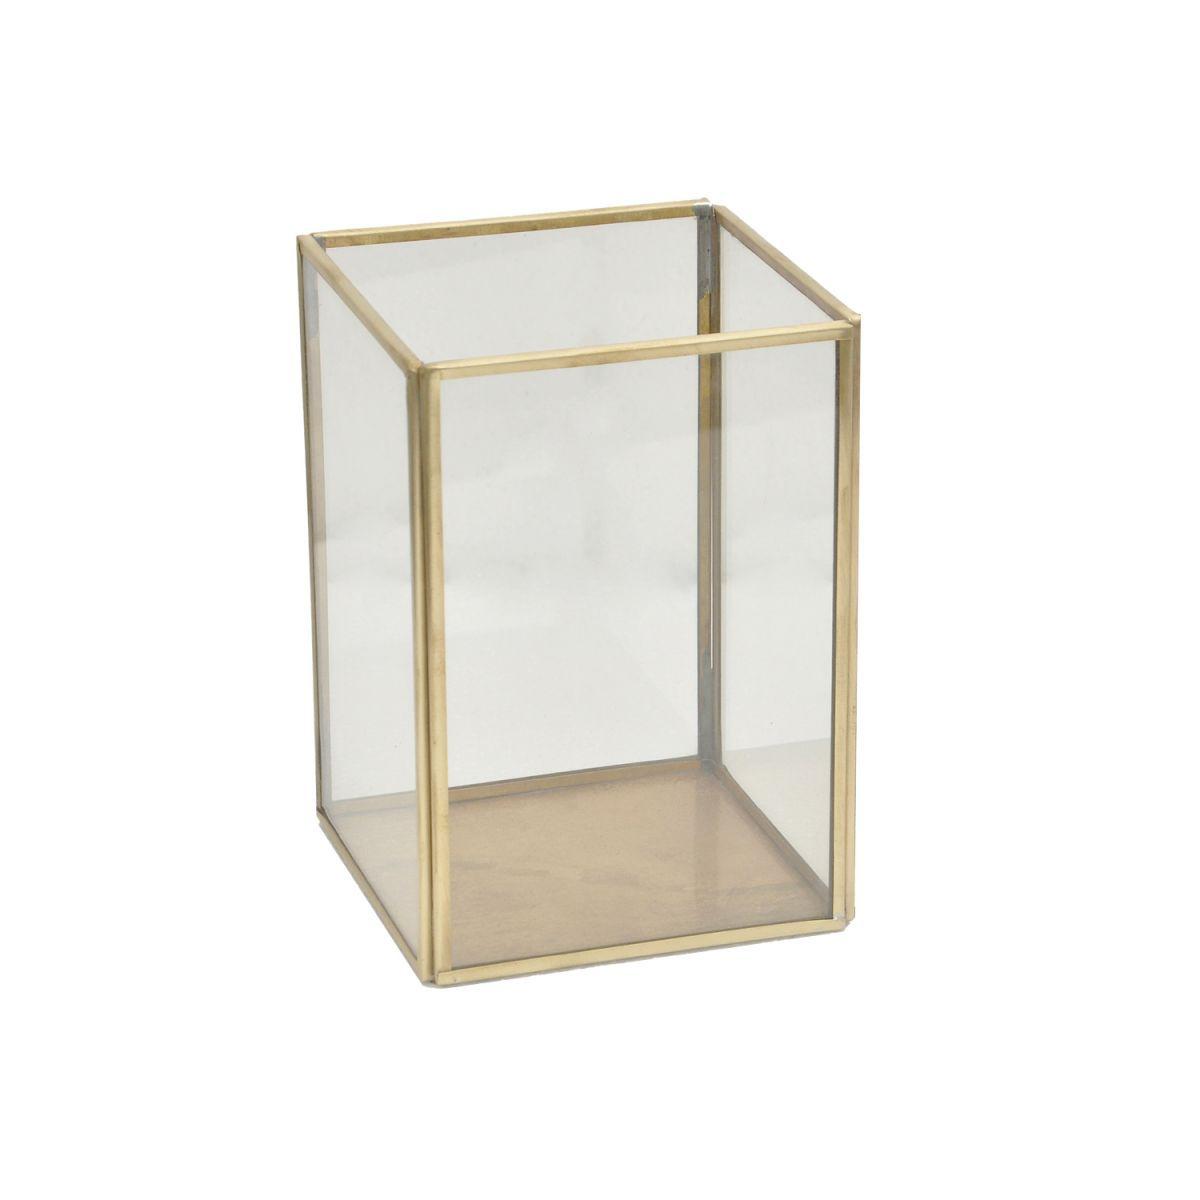 lantaarn glas vierkant messing tint 11x11 hg 155cm